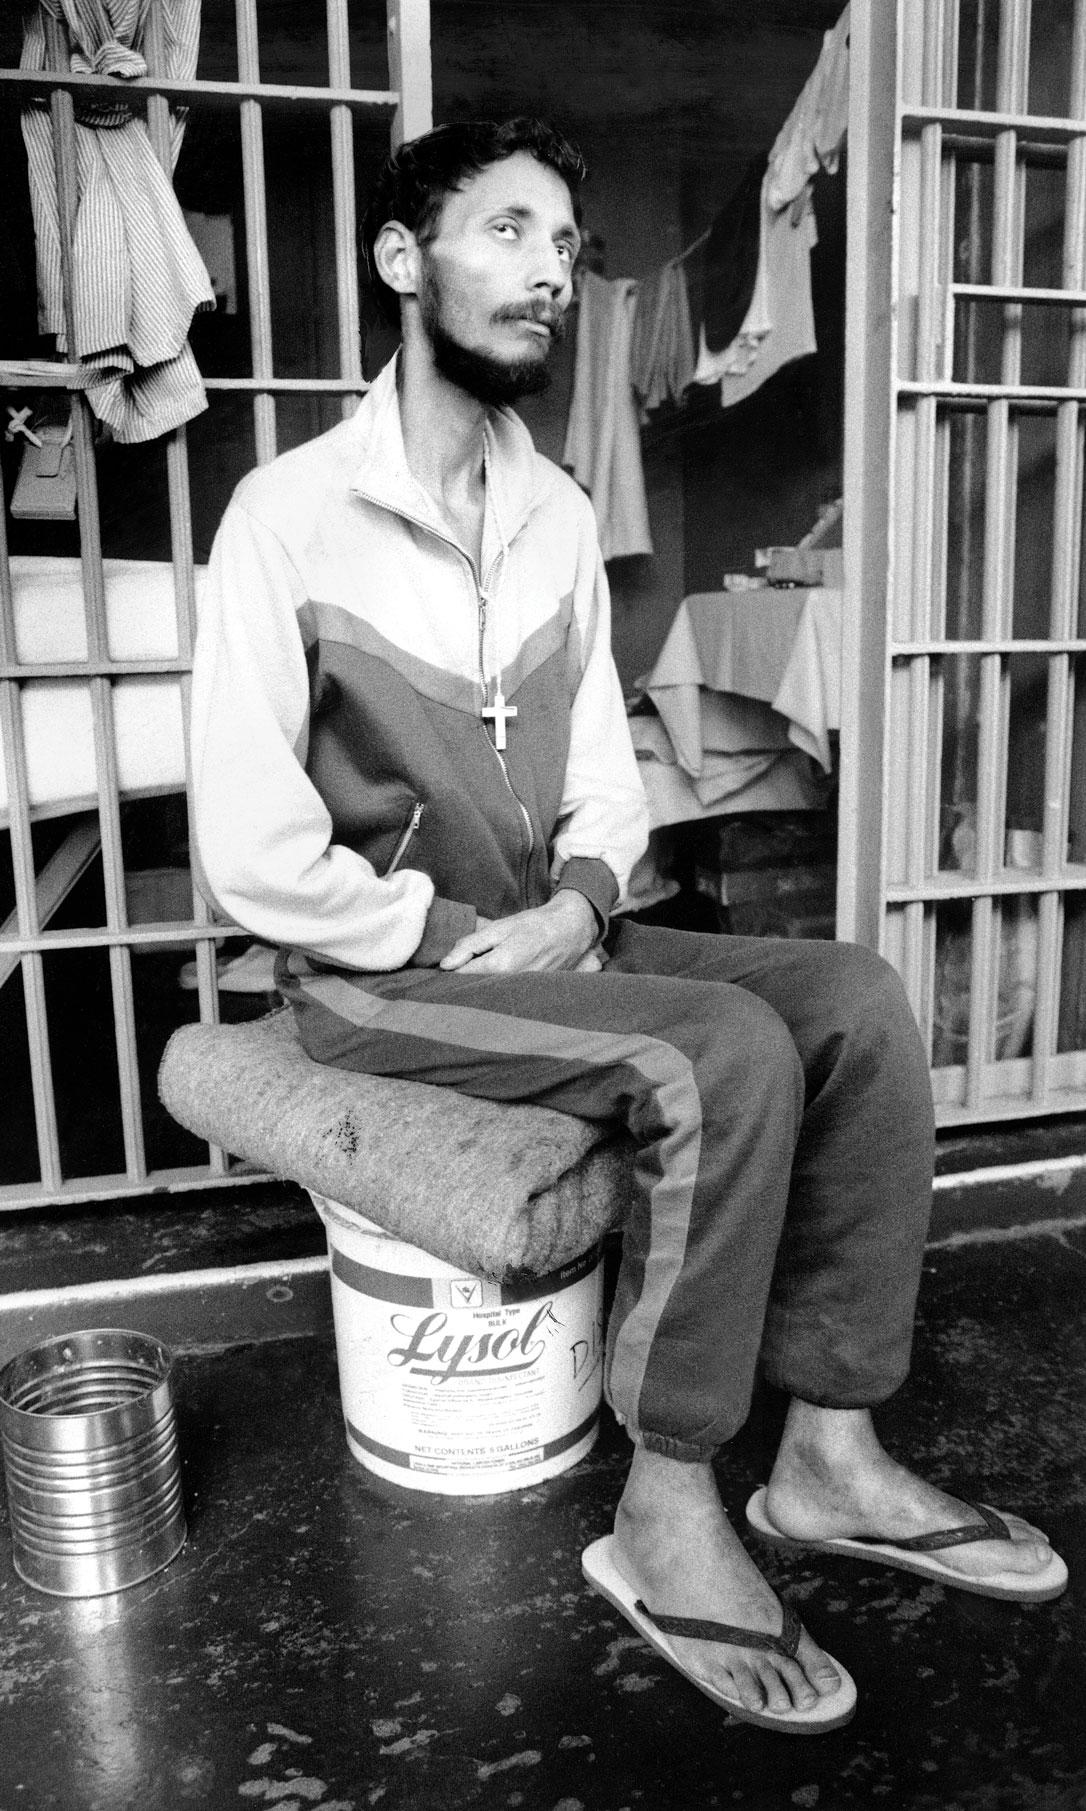 Prisoner with AIDS